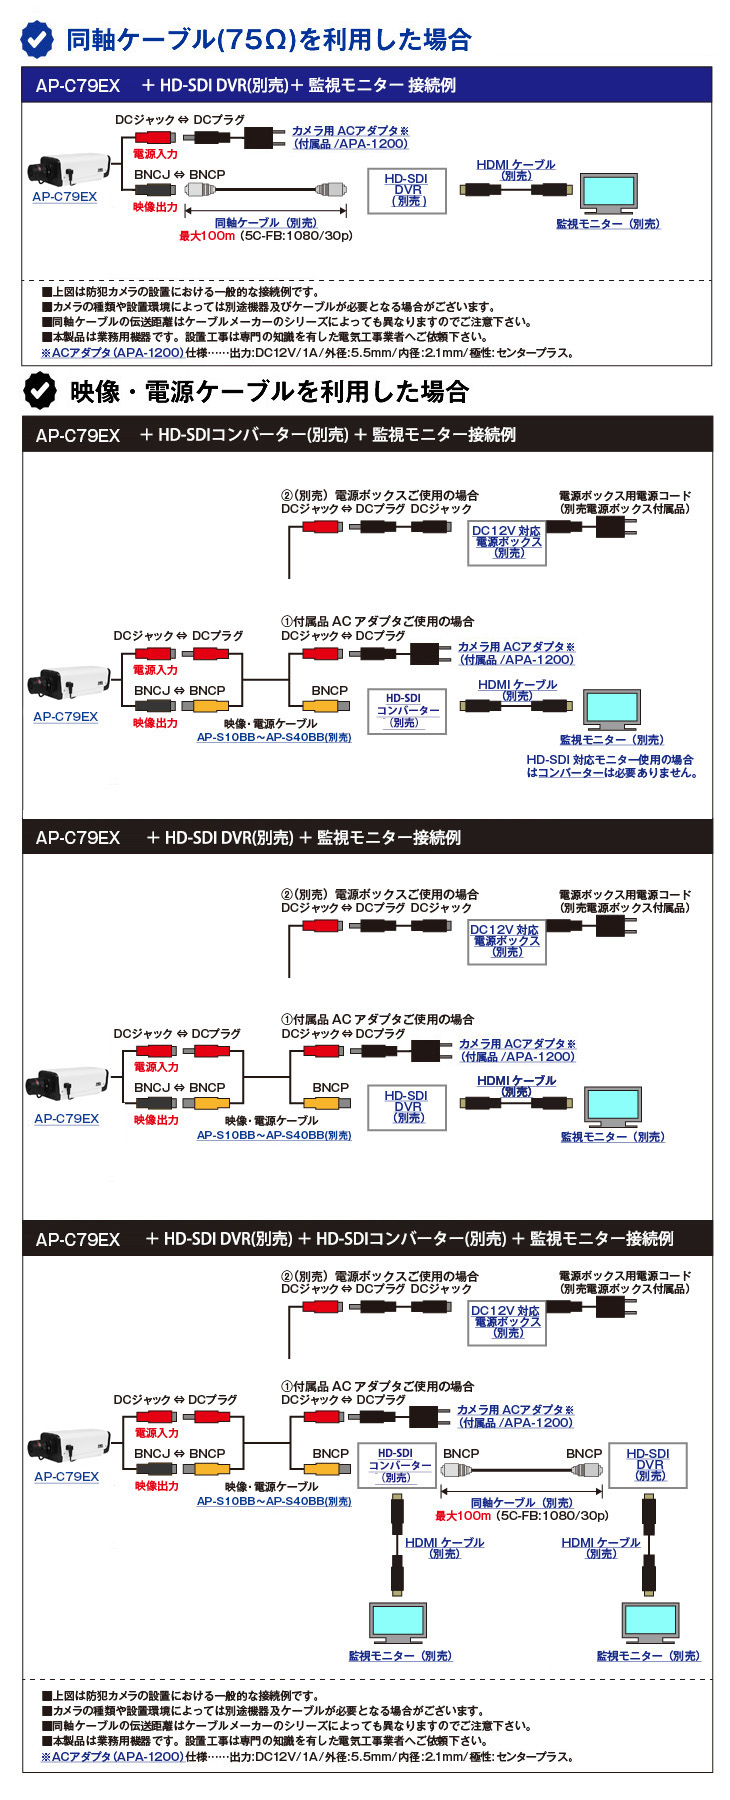 HD-SDI 213万画素防犯カメラ(AP-C79EX)の接続イメージ